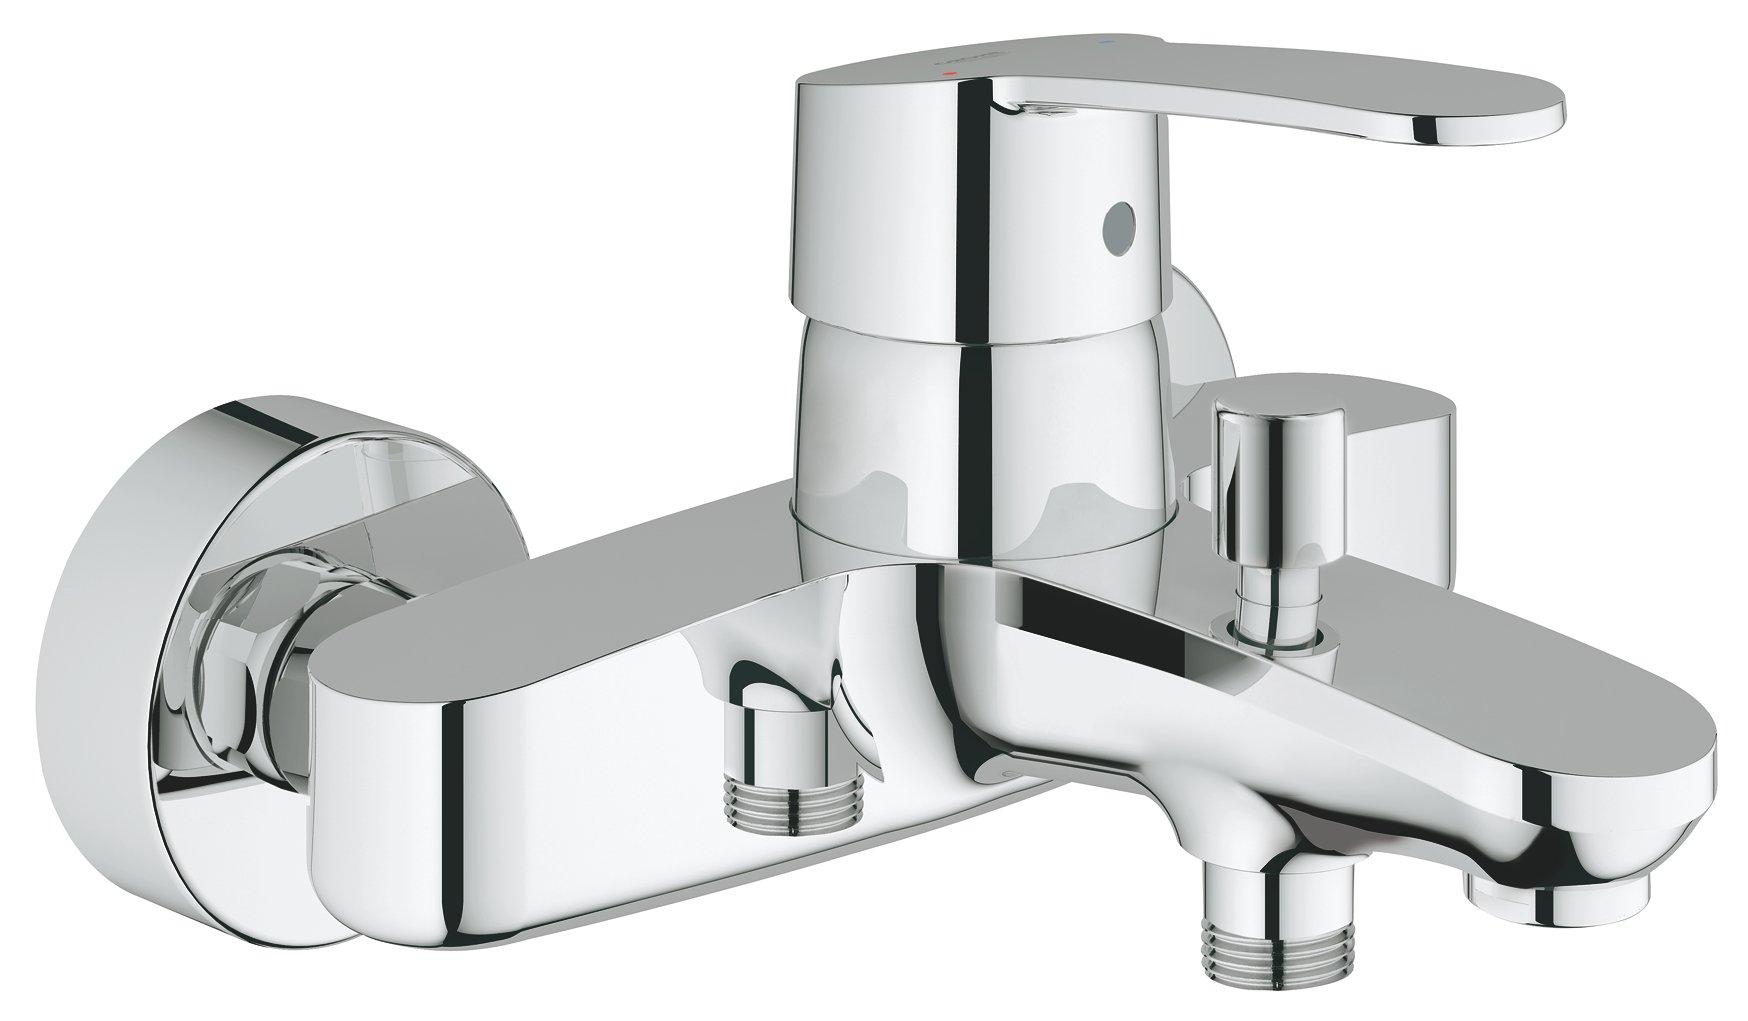 Badkamer Kraan Praxis : ▷ praxis kranen badkamer kopen online internetwinkel